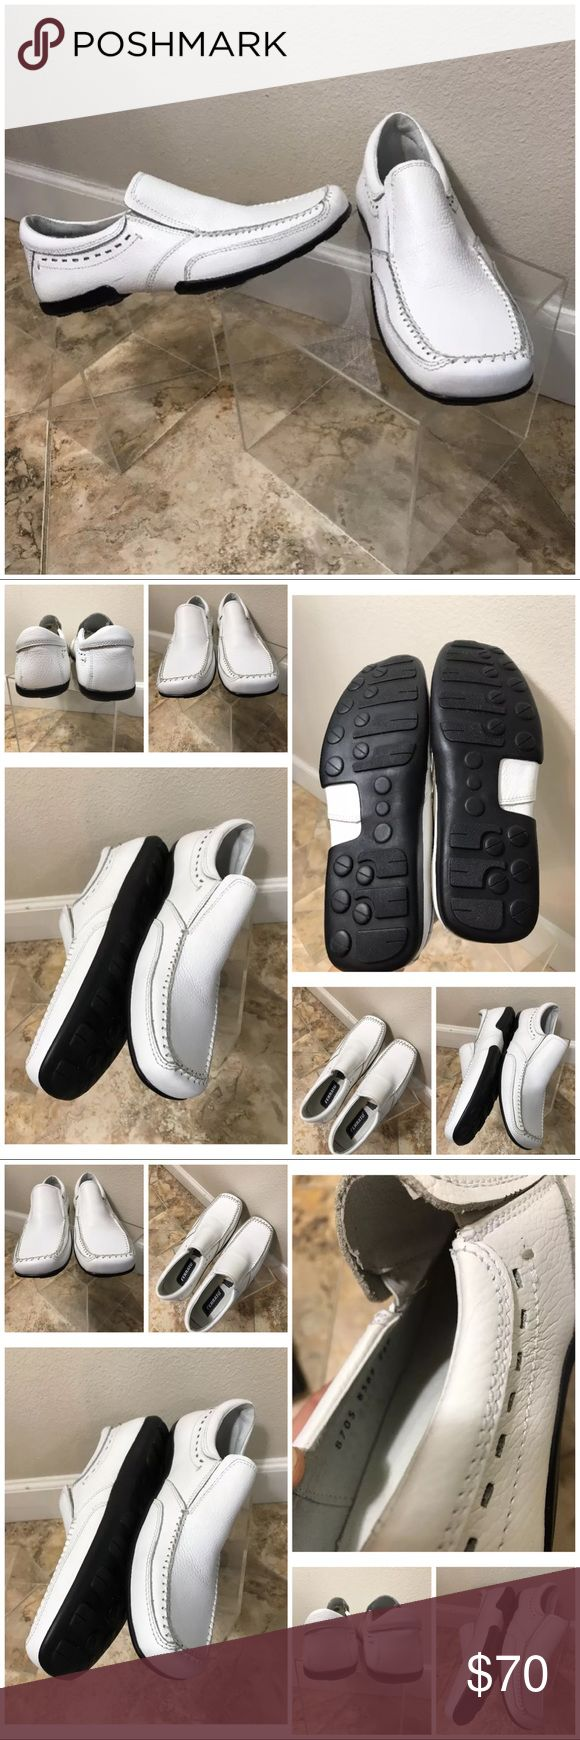 c9e0bb4e Ferrato men's slip ons Loafers shoes size 9 Ferrato white leather men's  shoes size 9 ferrato